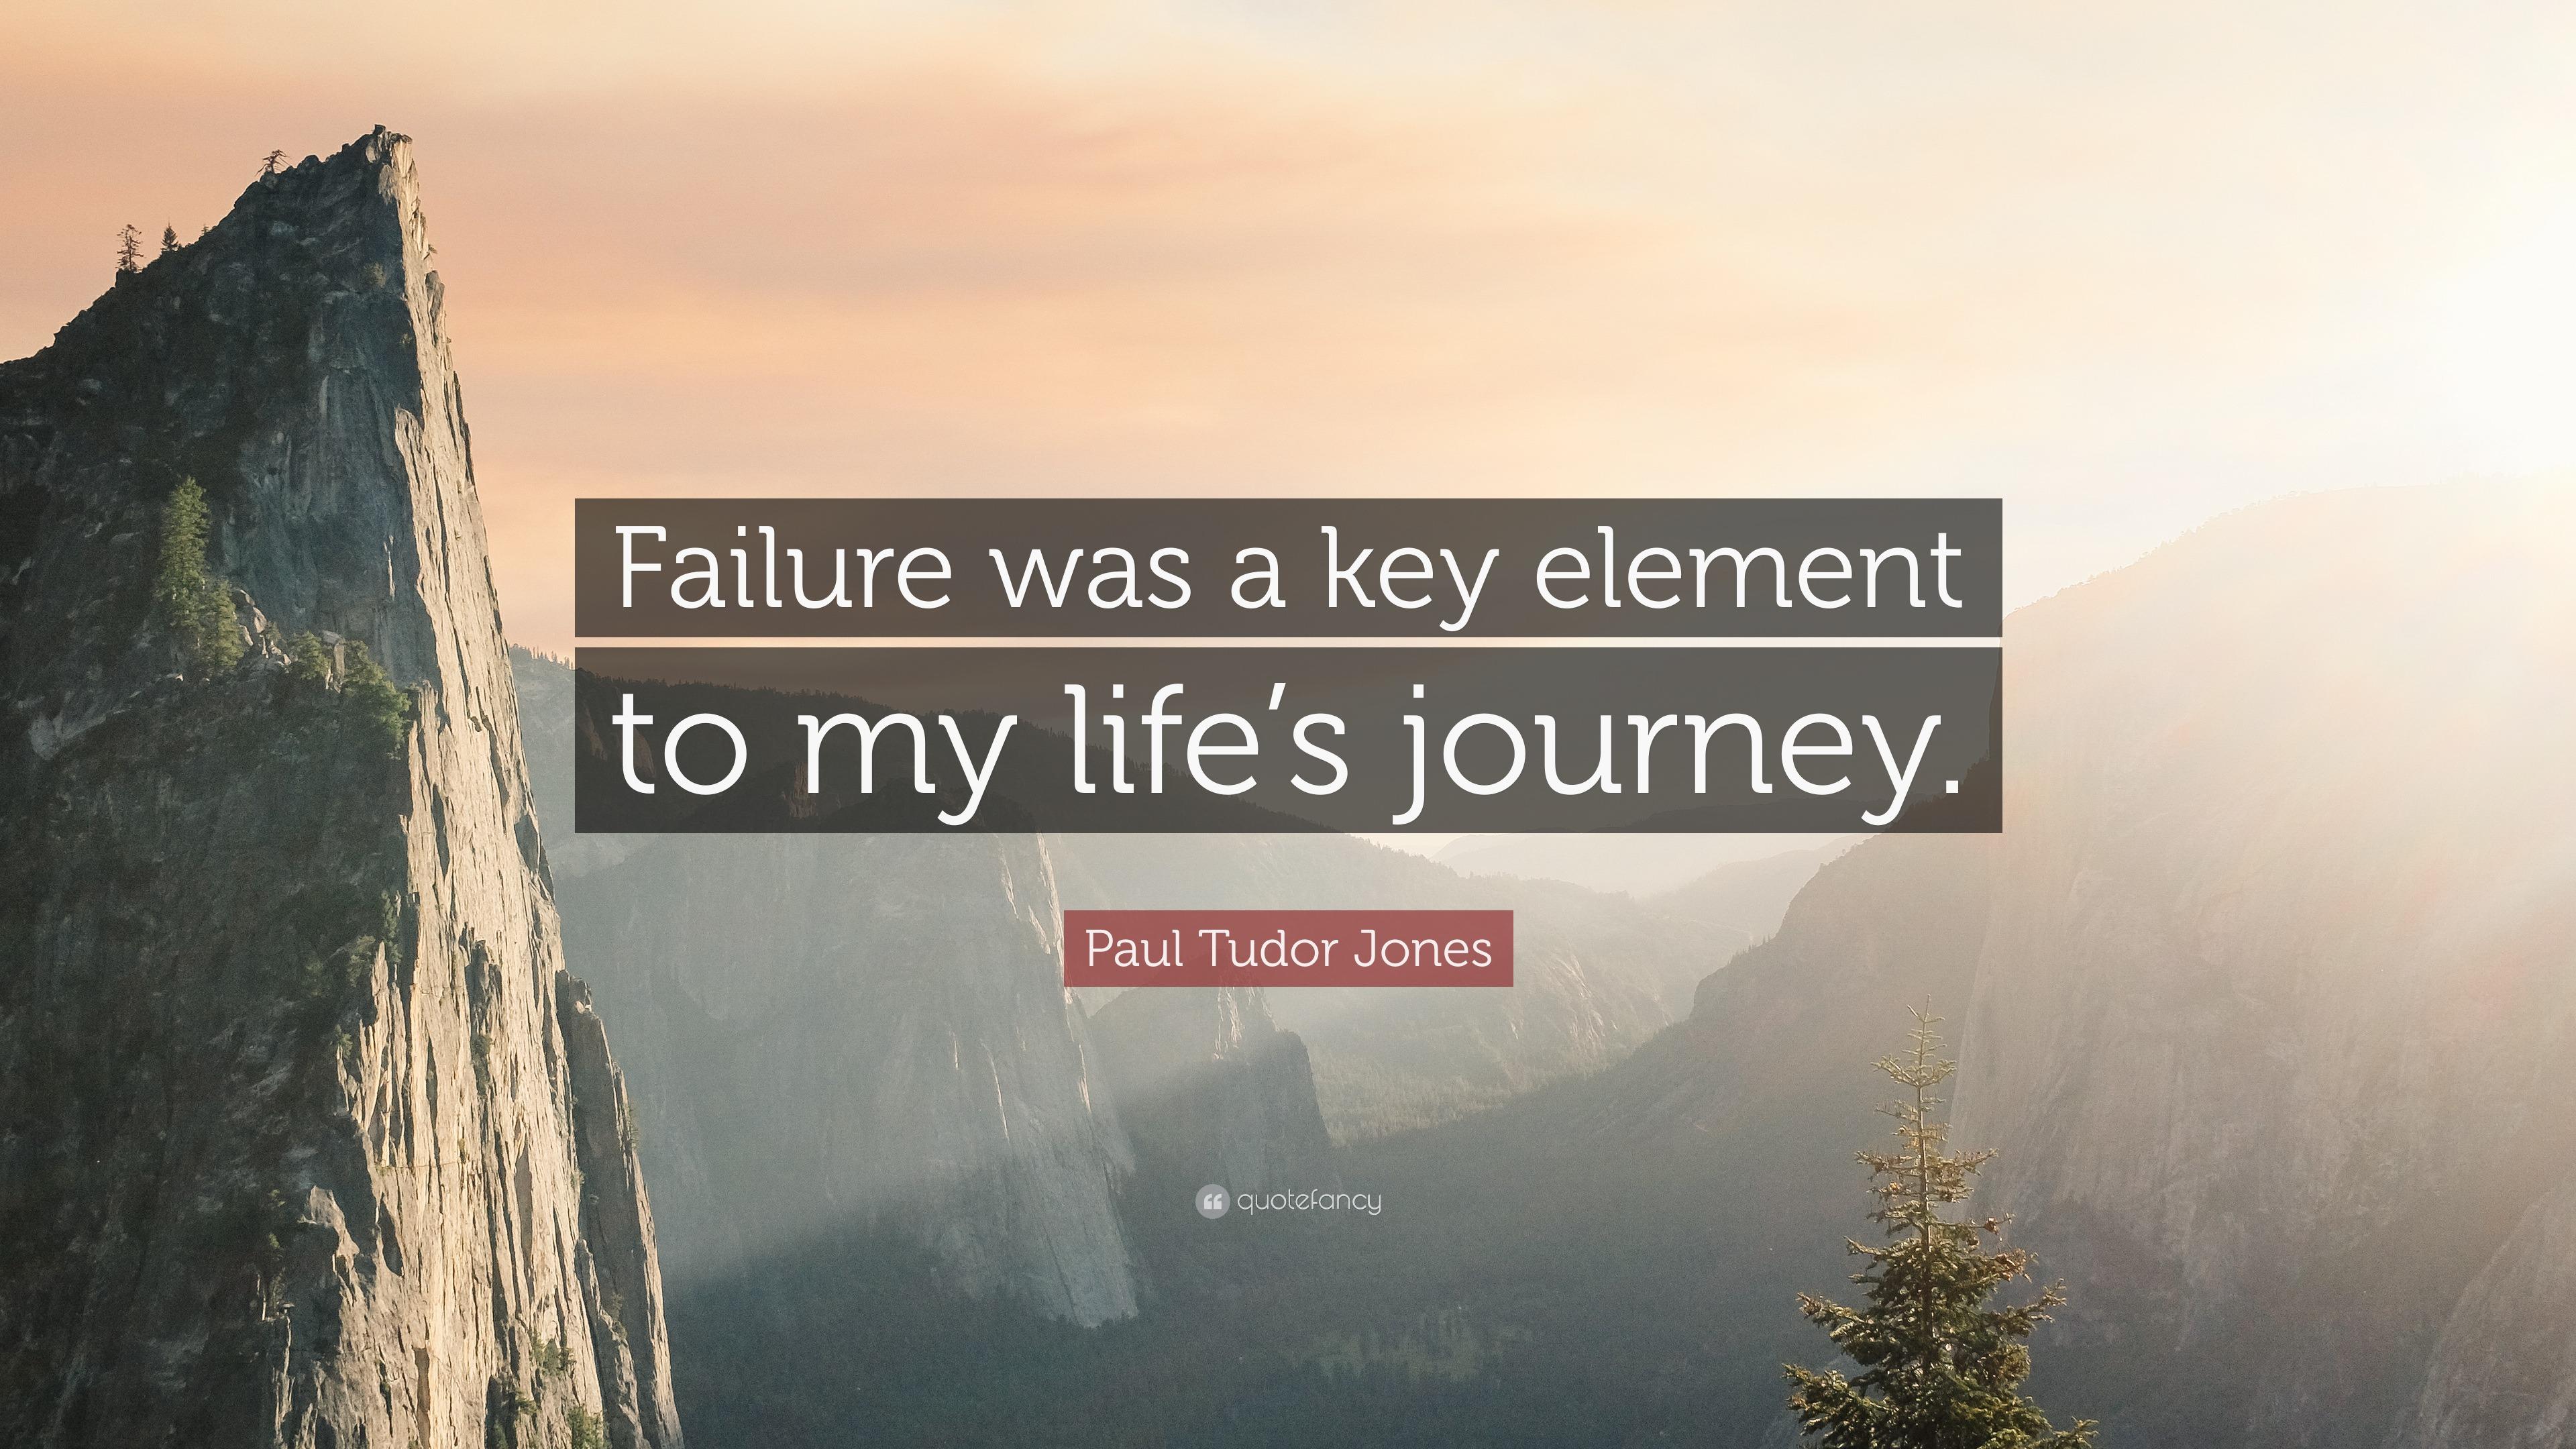 Paul Tudor Jones Quote Failure Was A Key Element To My Lifes